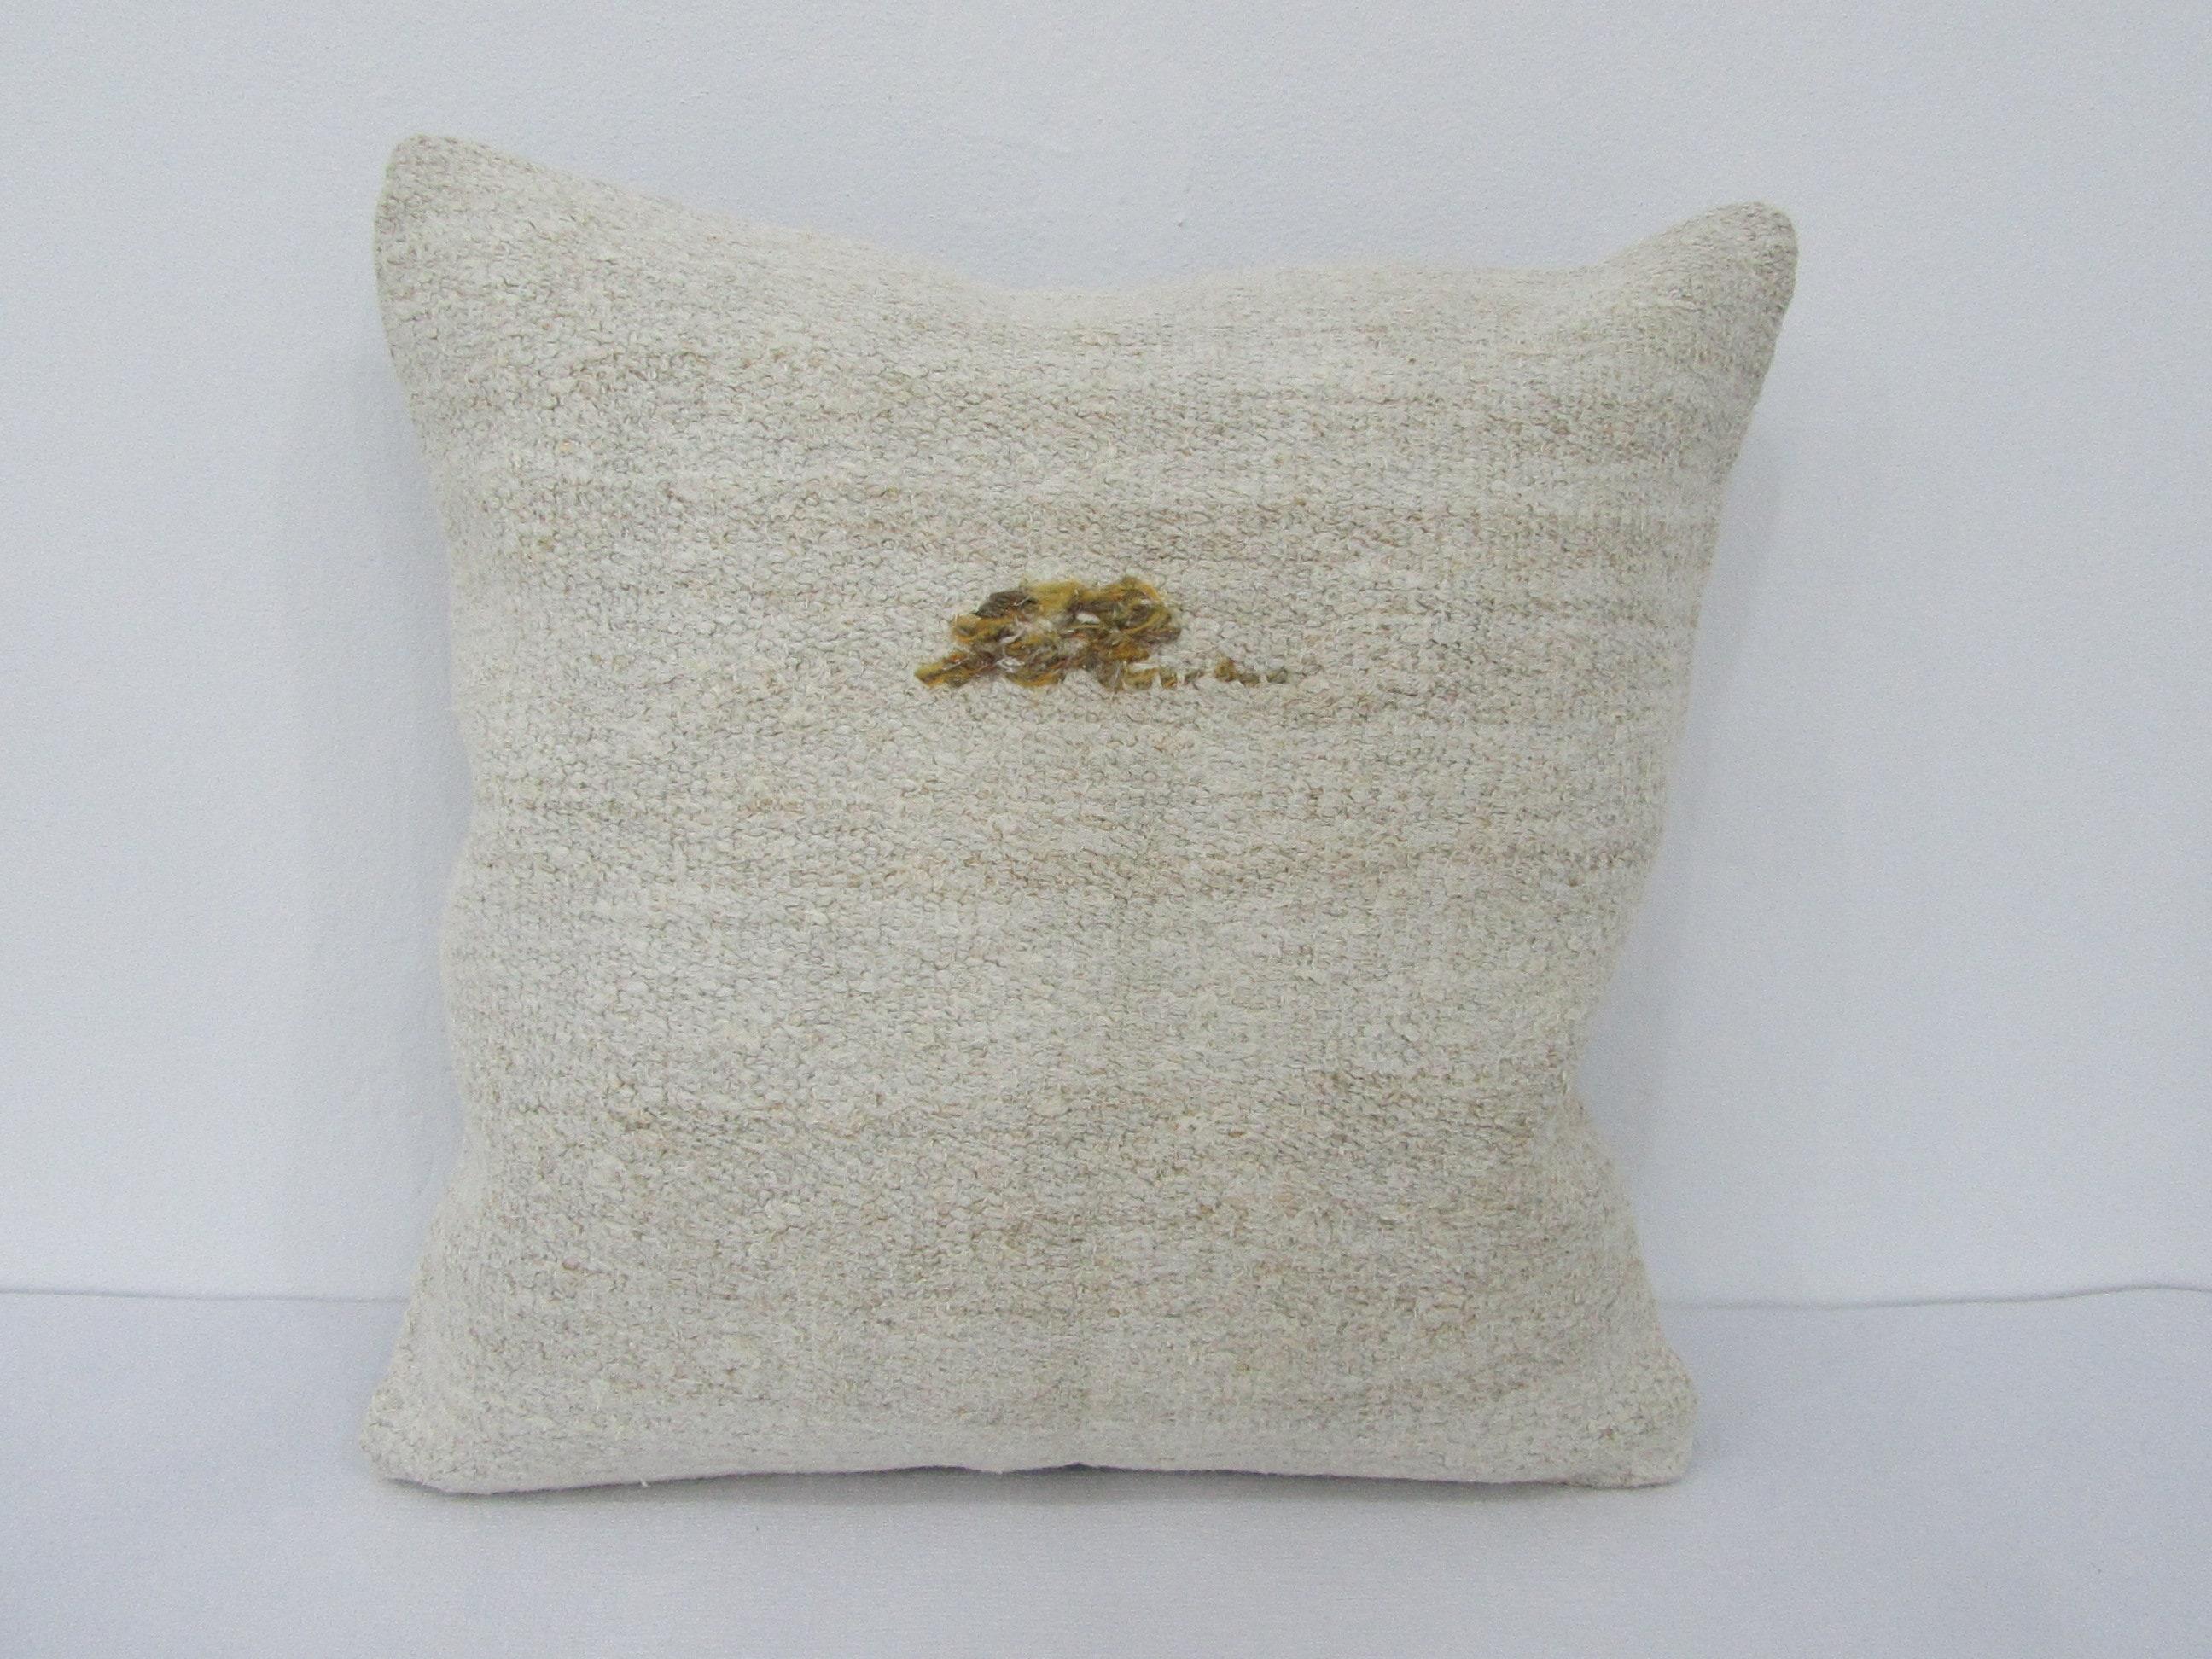 Sofa Pillow Cover 30x50 Cm Vintage Pillow Cover, Lumbar Pillow Cover 12x20 \u0130nches Handmade Pillow Cover White Hemp Pillow Cover